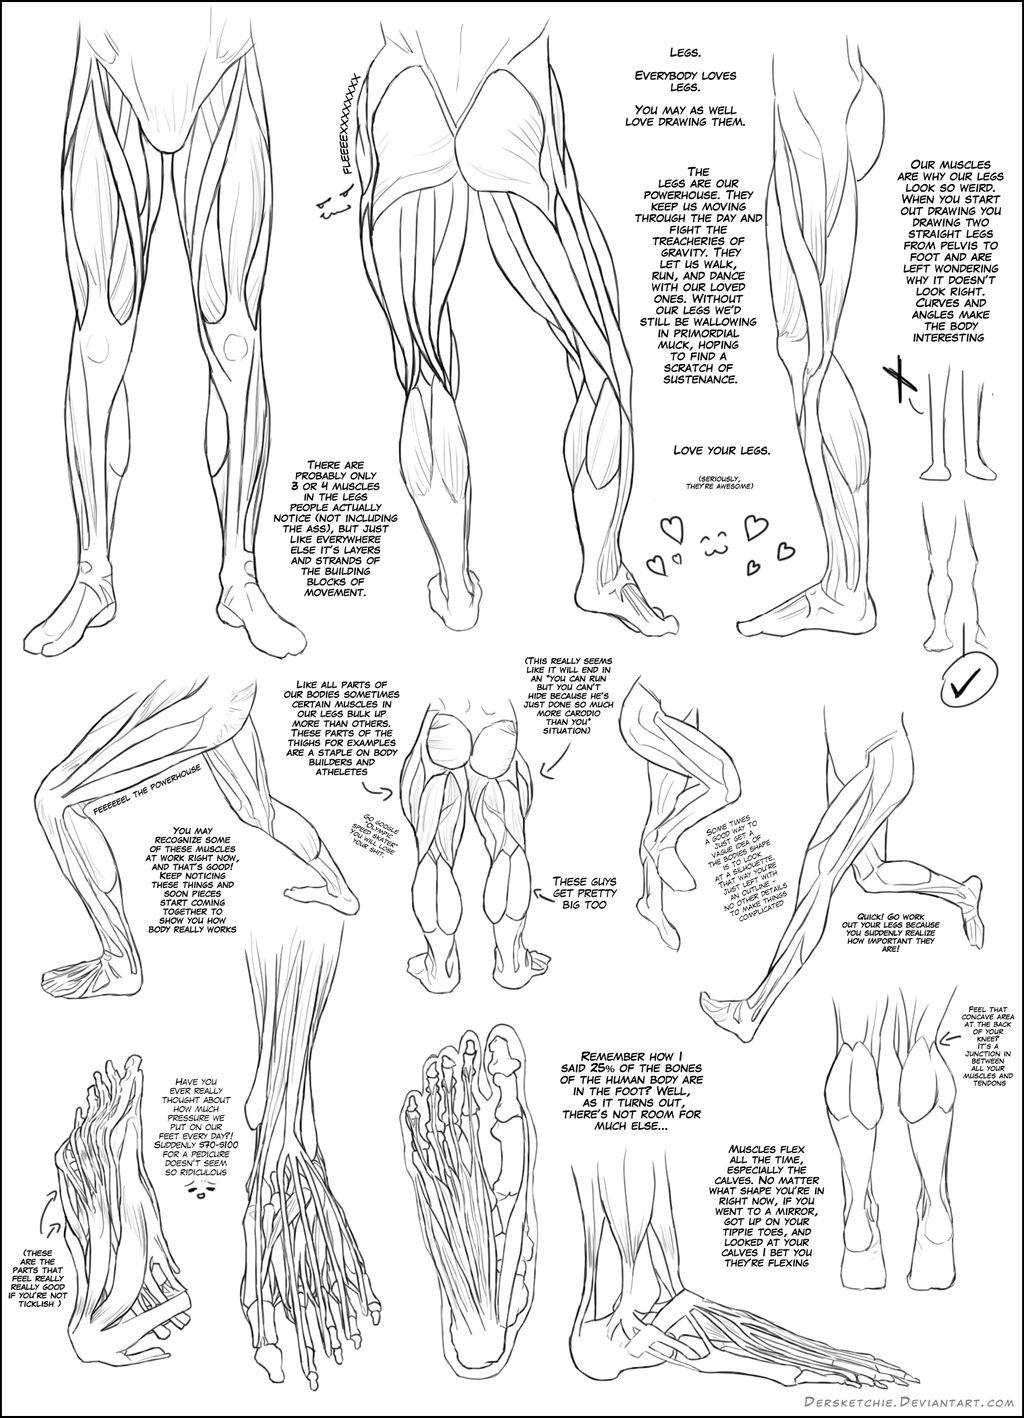 Muscles - Lower Body